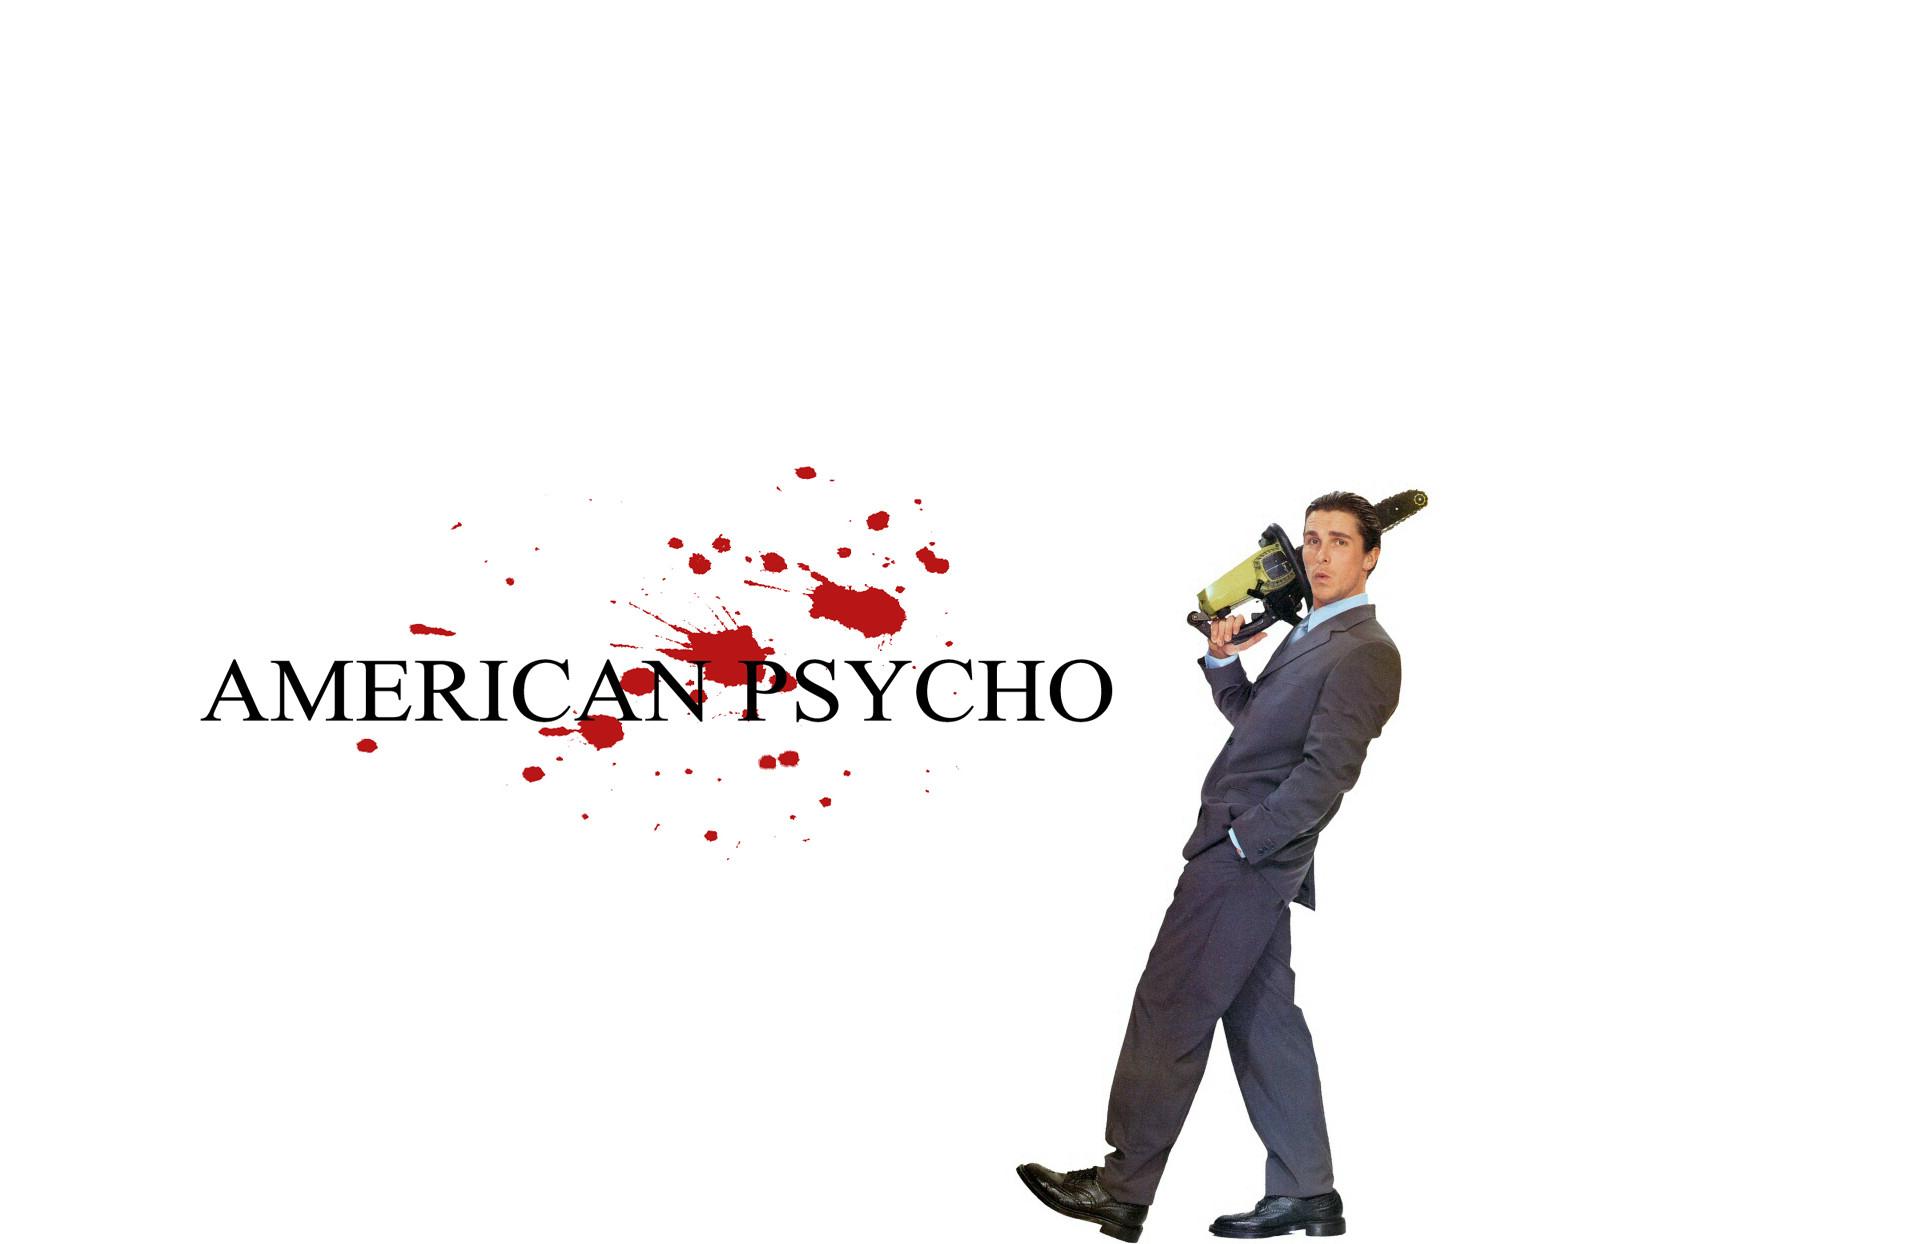 american psycho christian bale patrick bateman HD Wallpaper of .